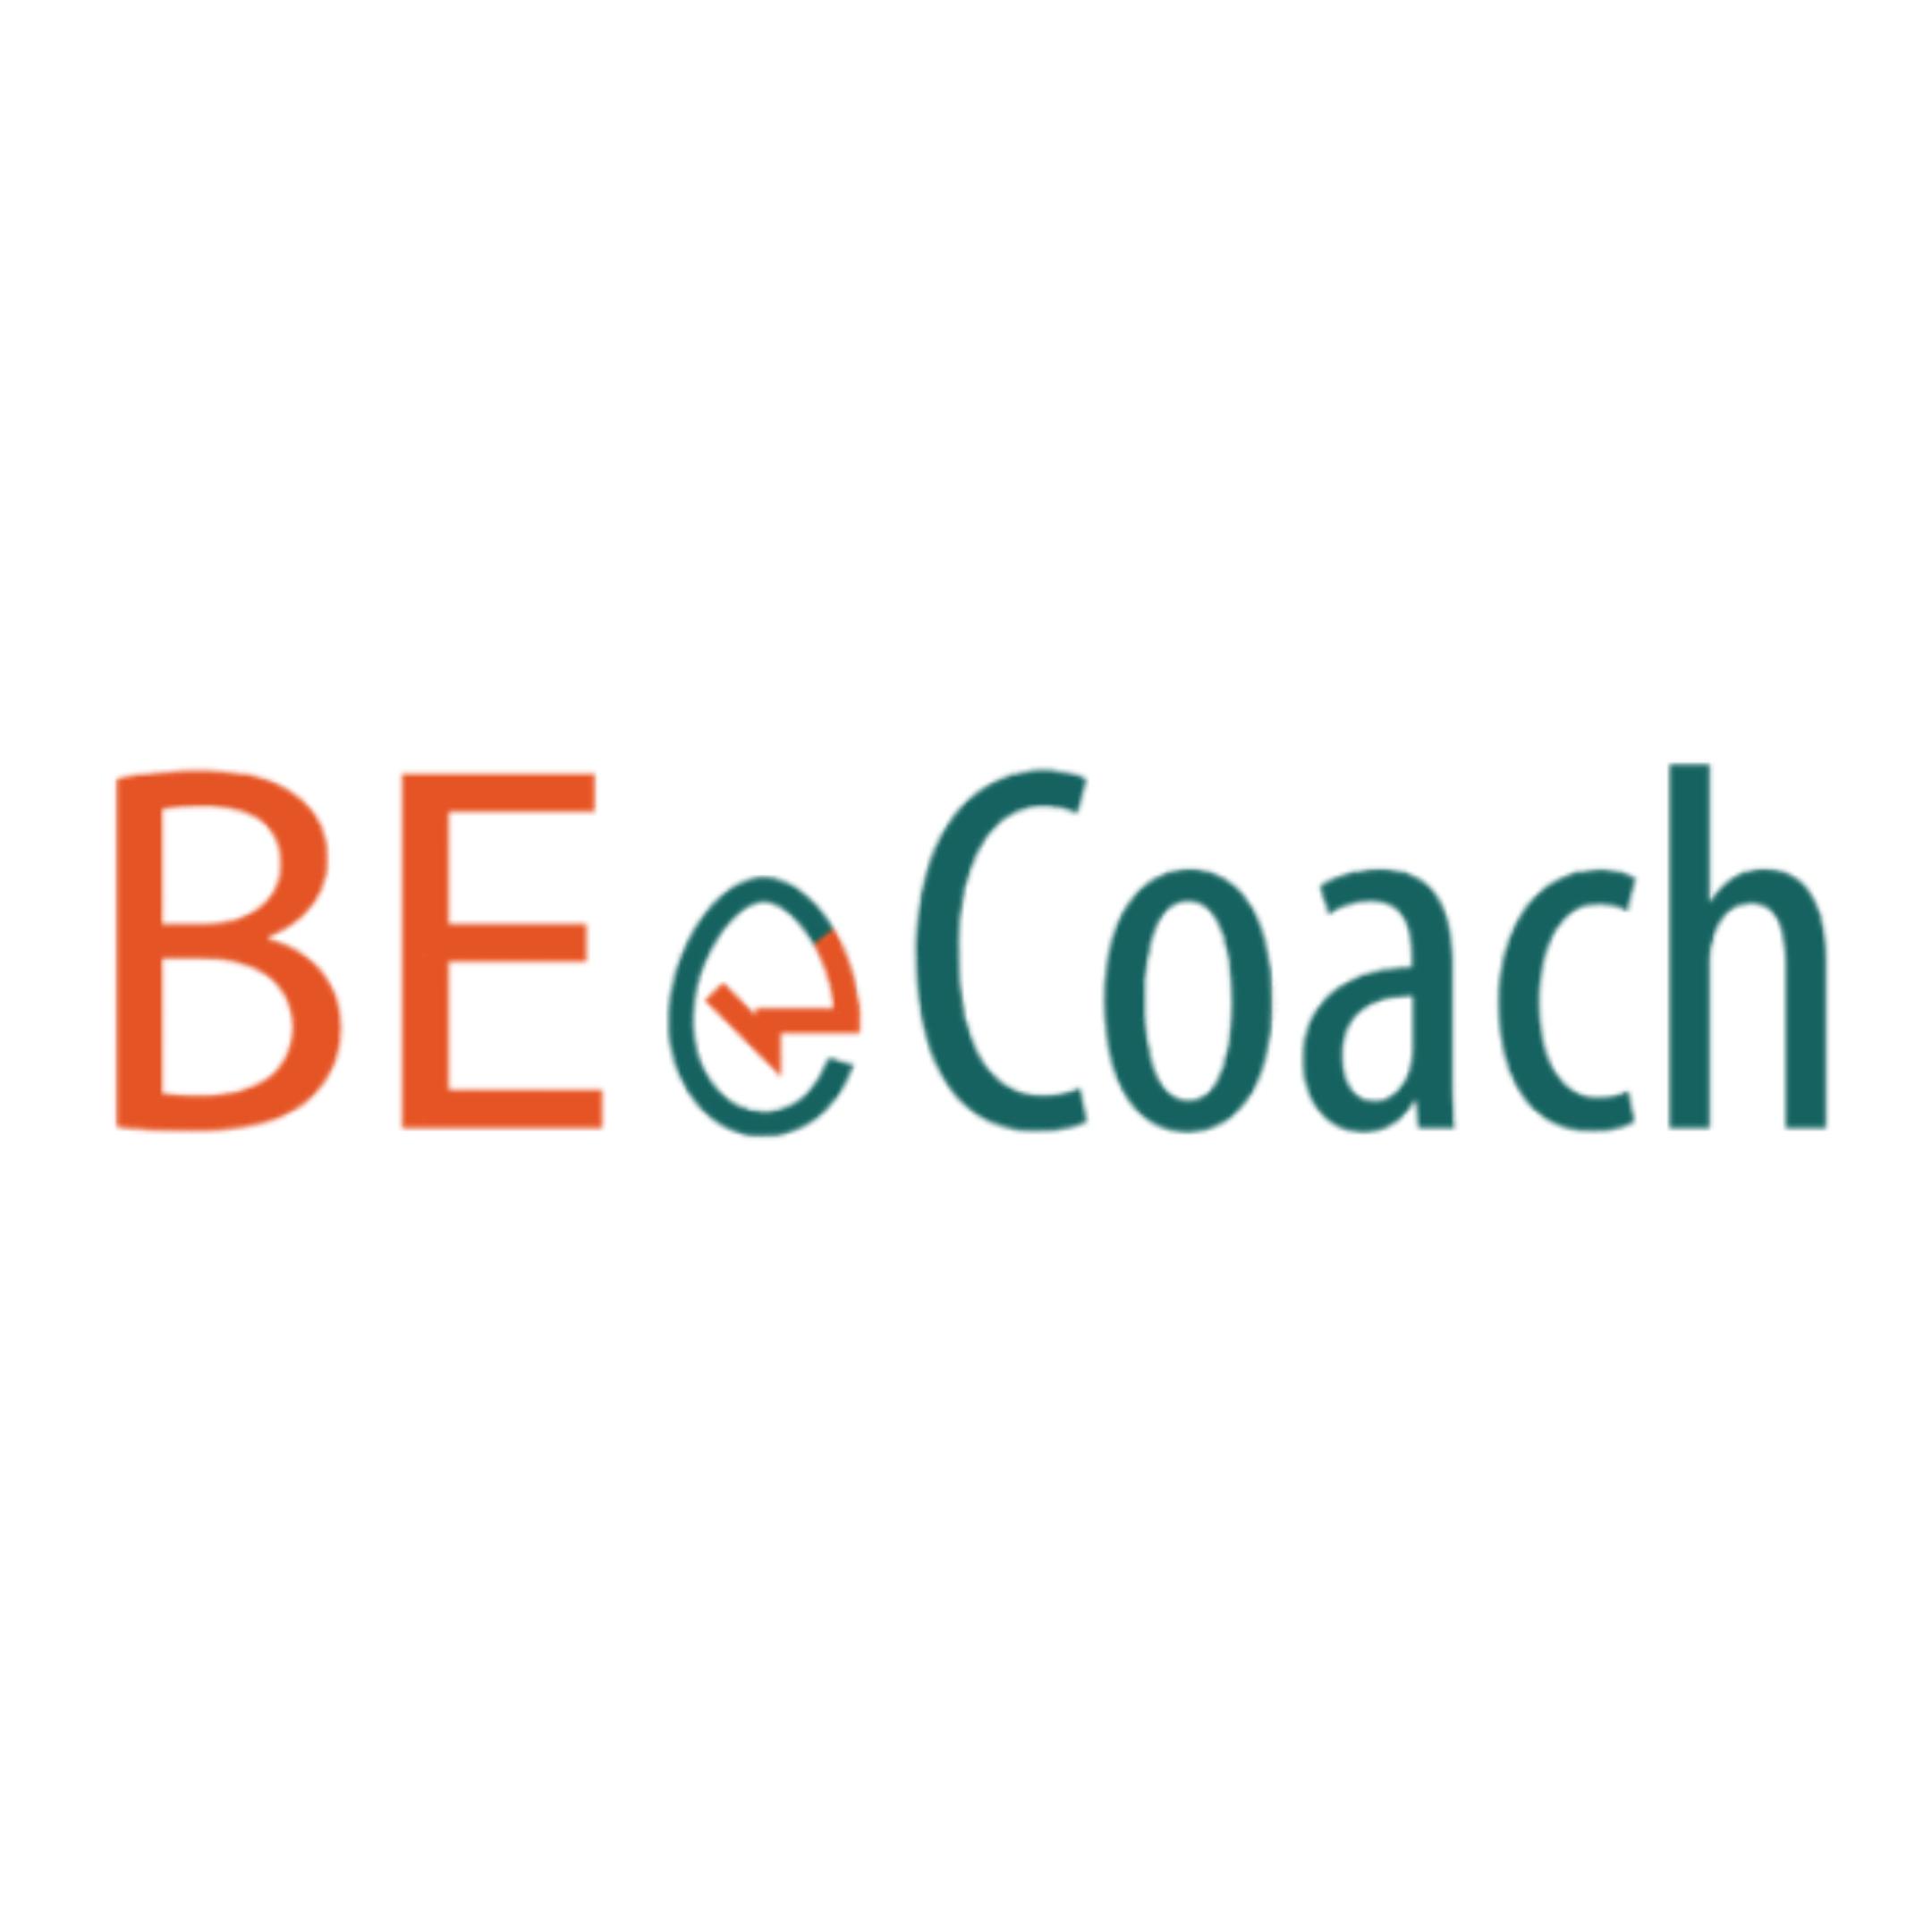 BEecoach